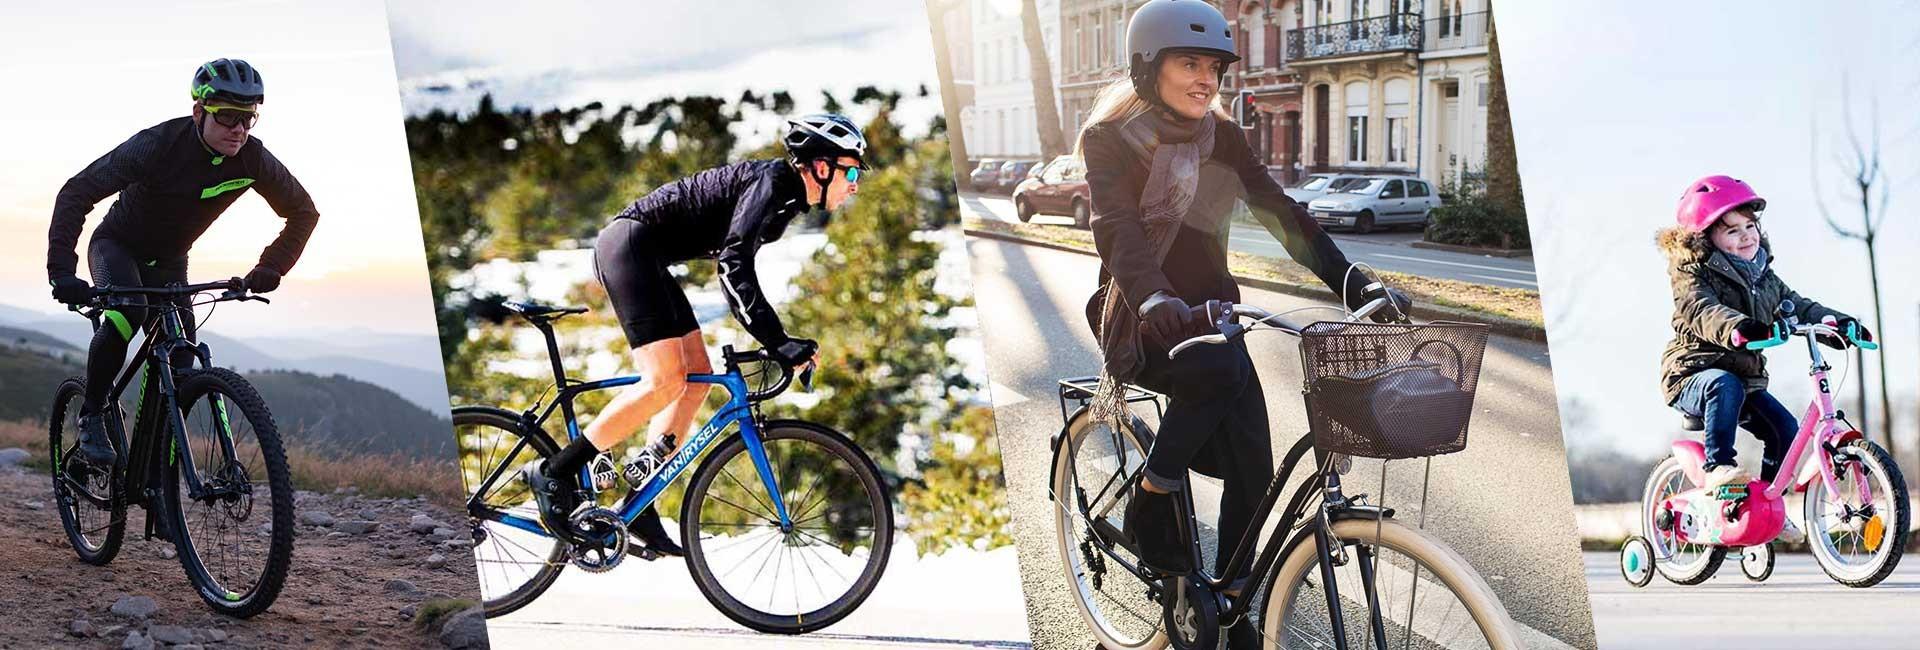 bike-dskt --- Expires on 24-08-2024